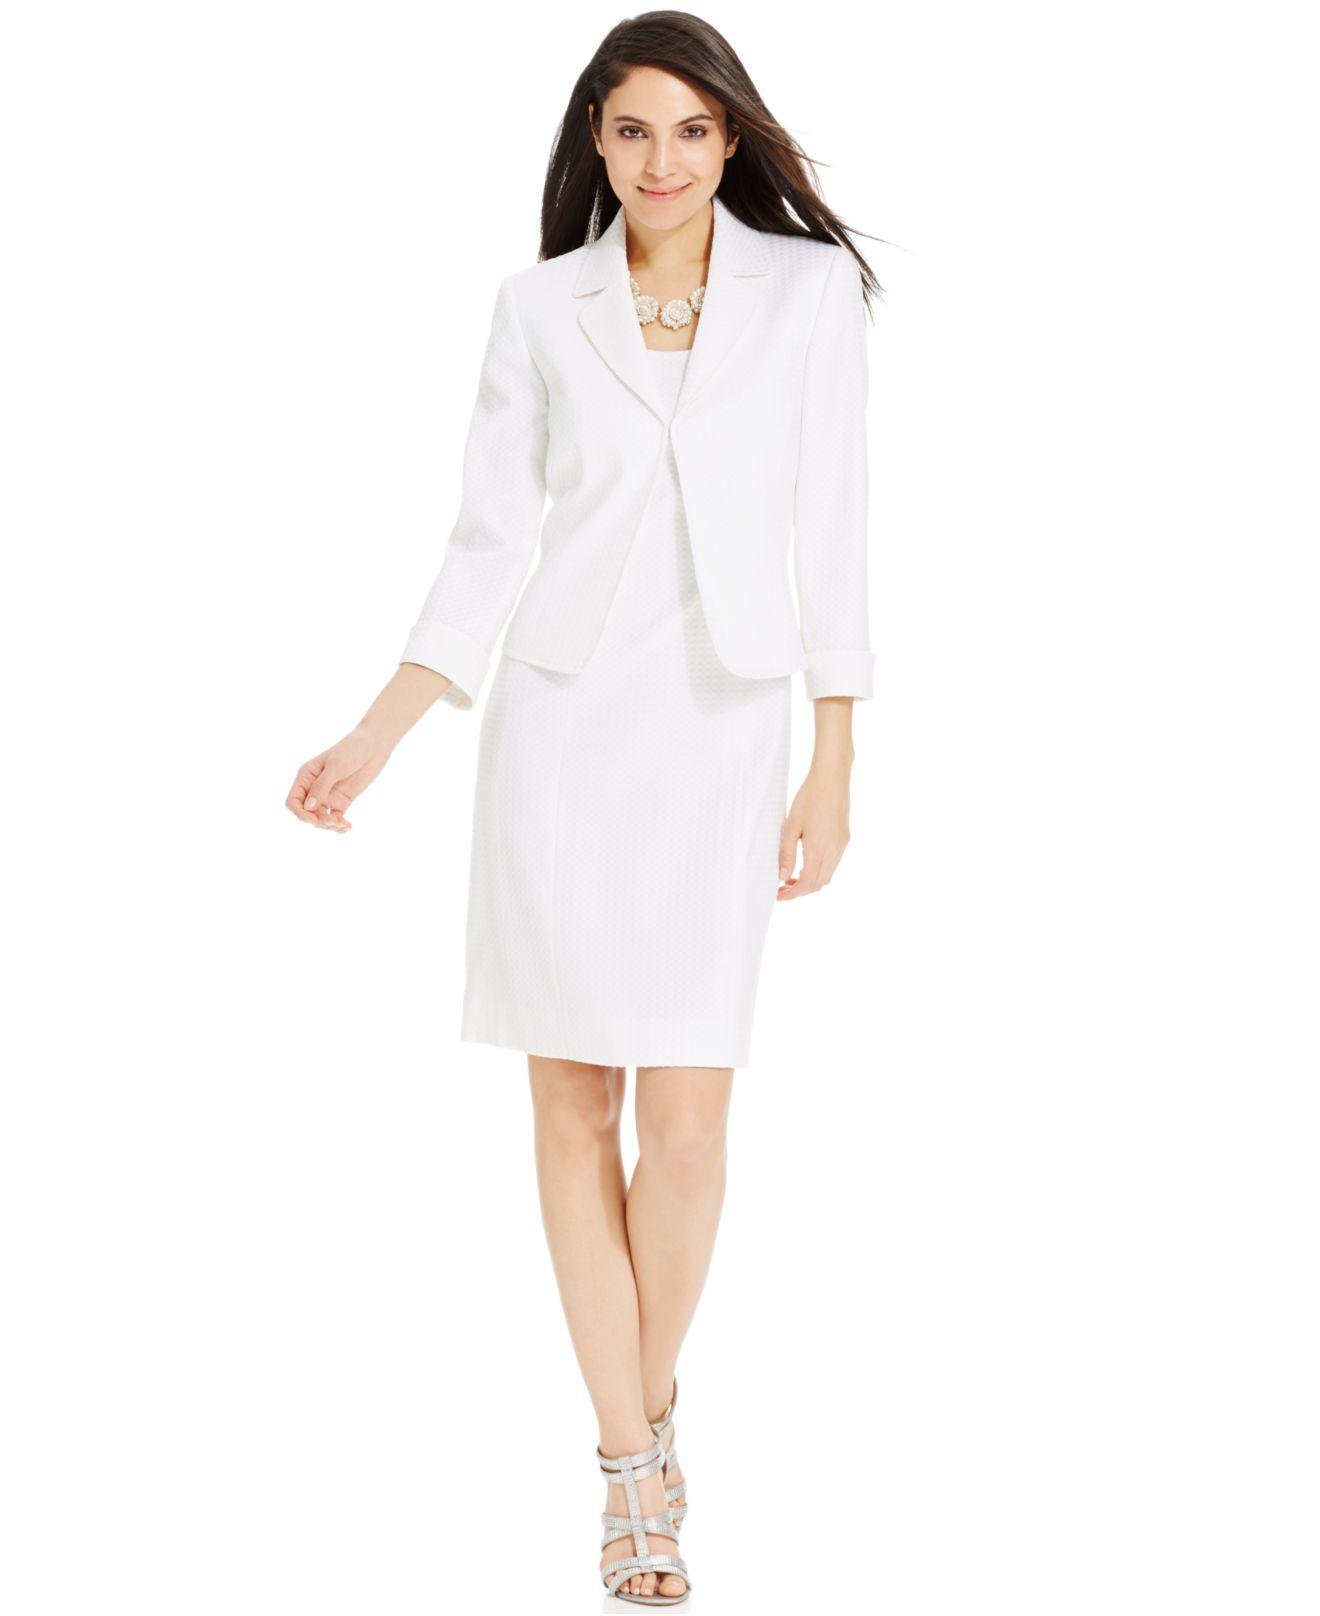 Lyst Tahari Textured Sleeveless Dress Suit In White